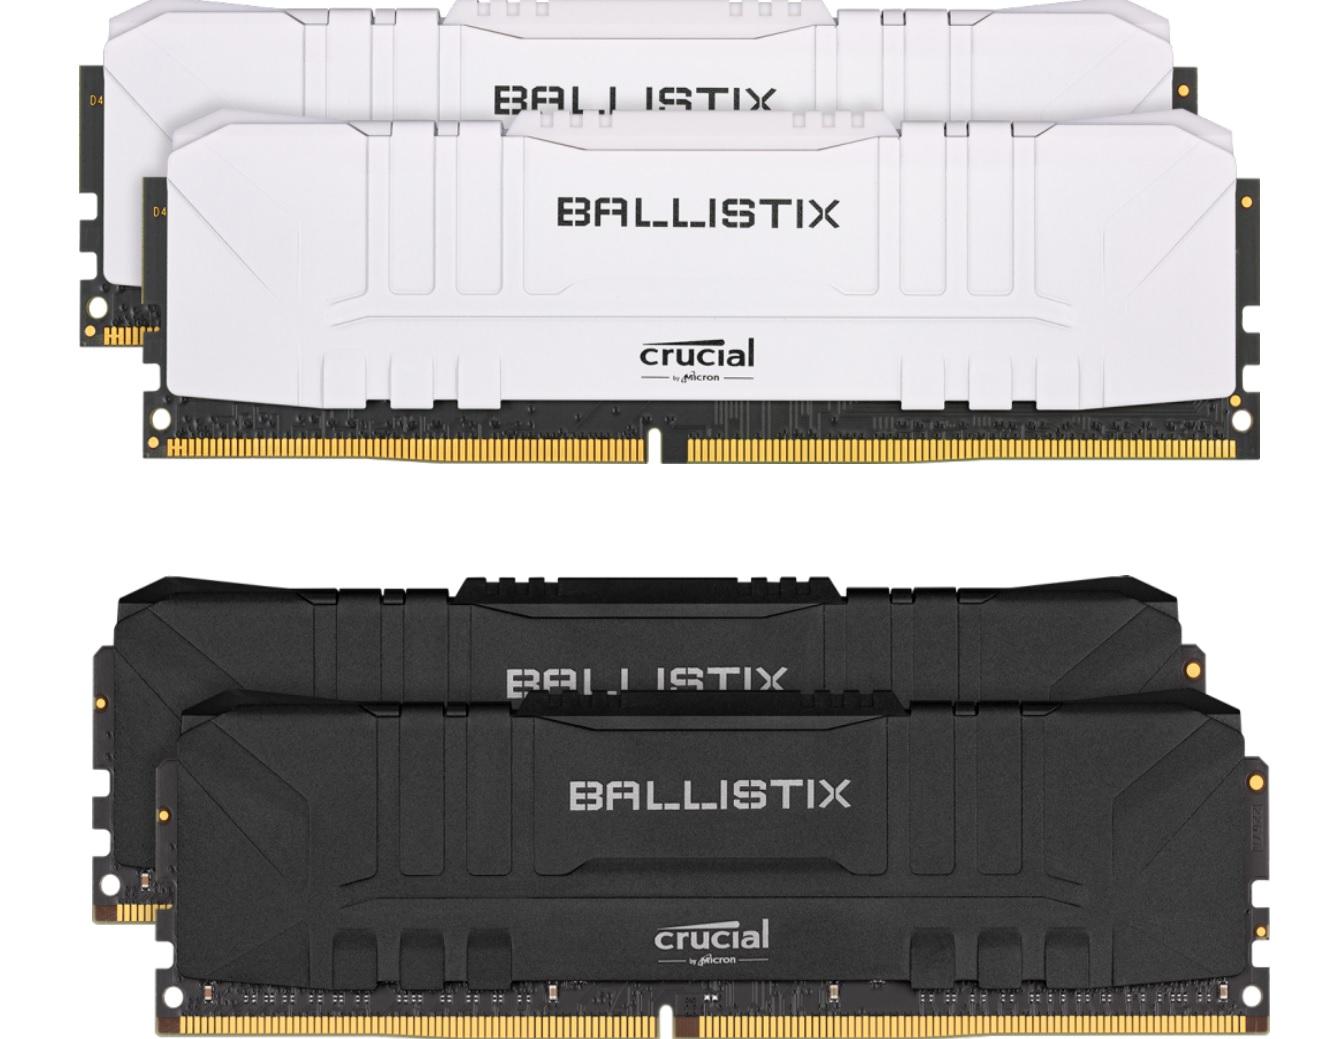 Kit Memory Crucial Ballistix DDR4 16 GB (2 x8 GB) - 3600 Mhz, CL16, Schwarz oder weiß